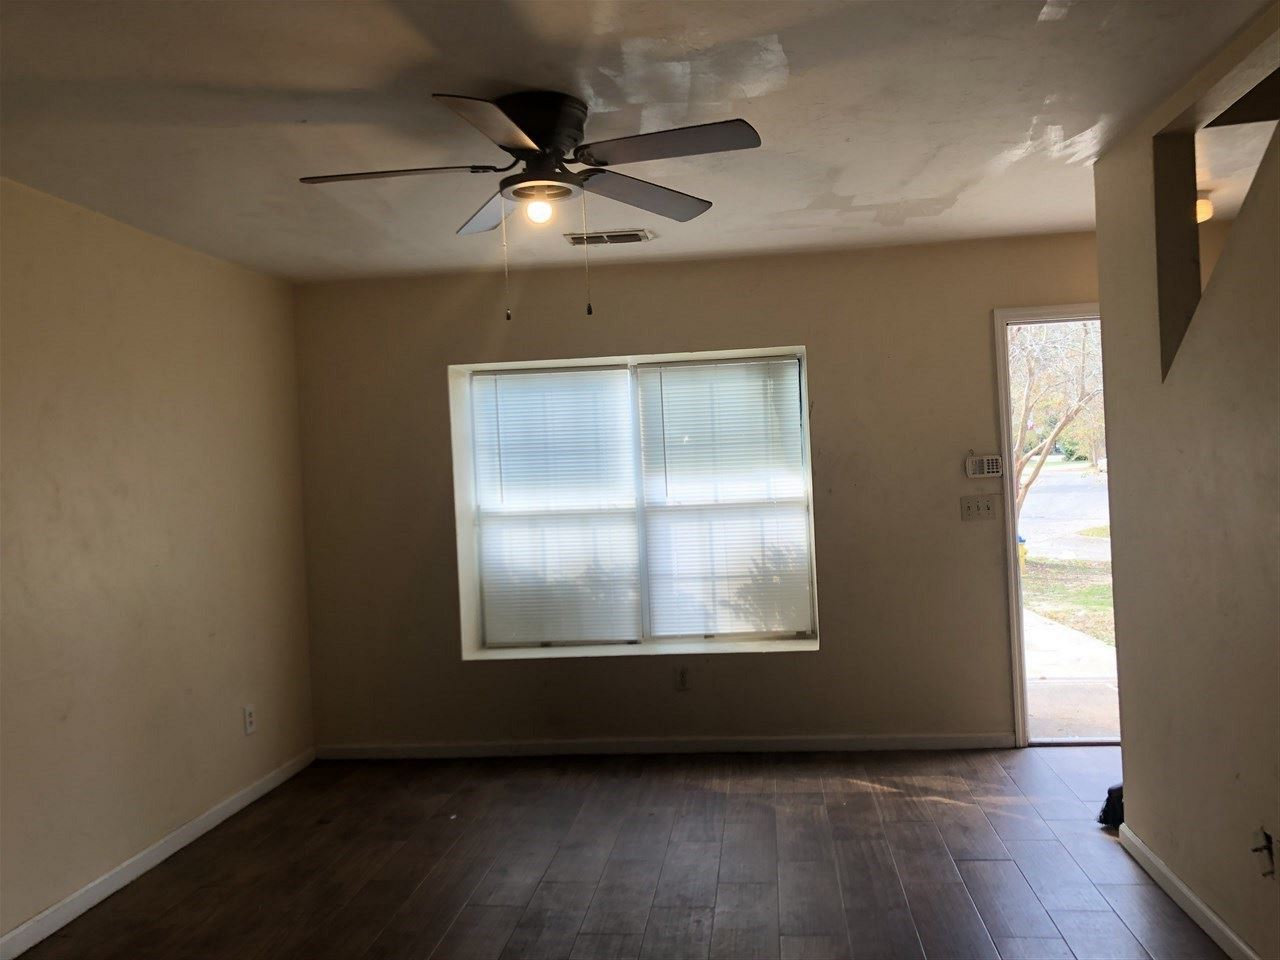 Photo of 2768 TESS Circle, TALLAHASSEE, FL 32304 (MLS # 323801)